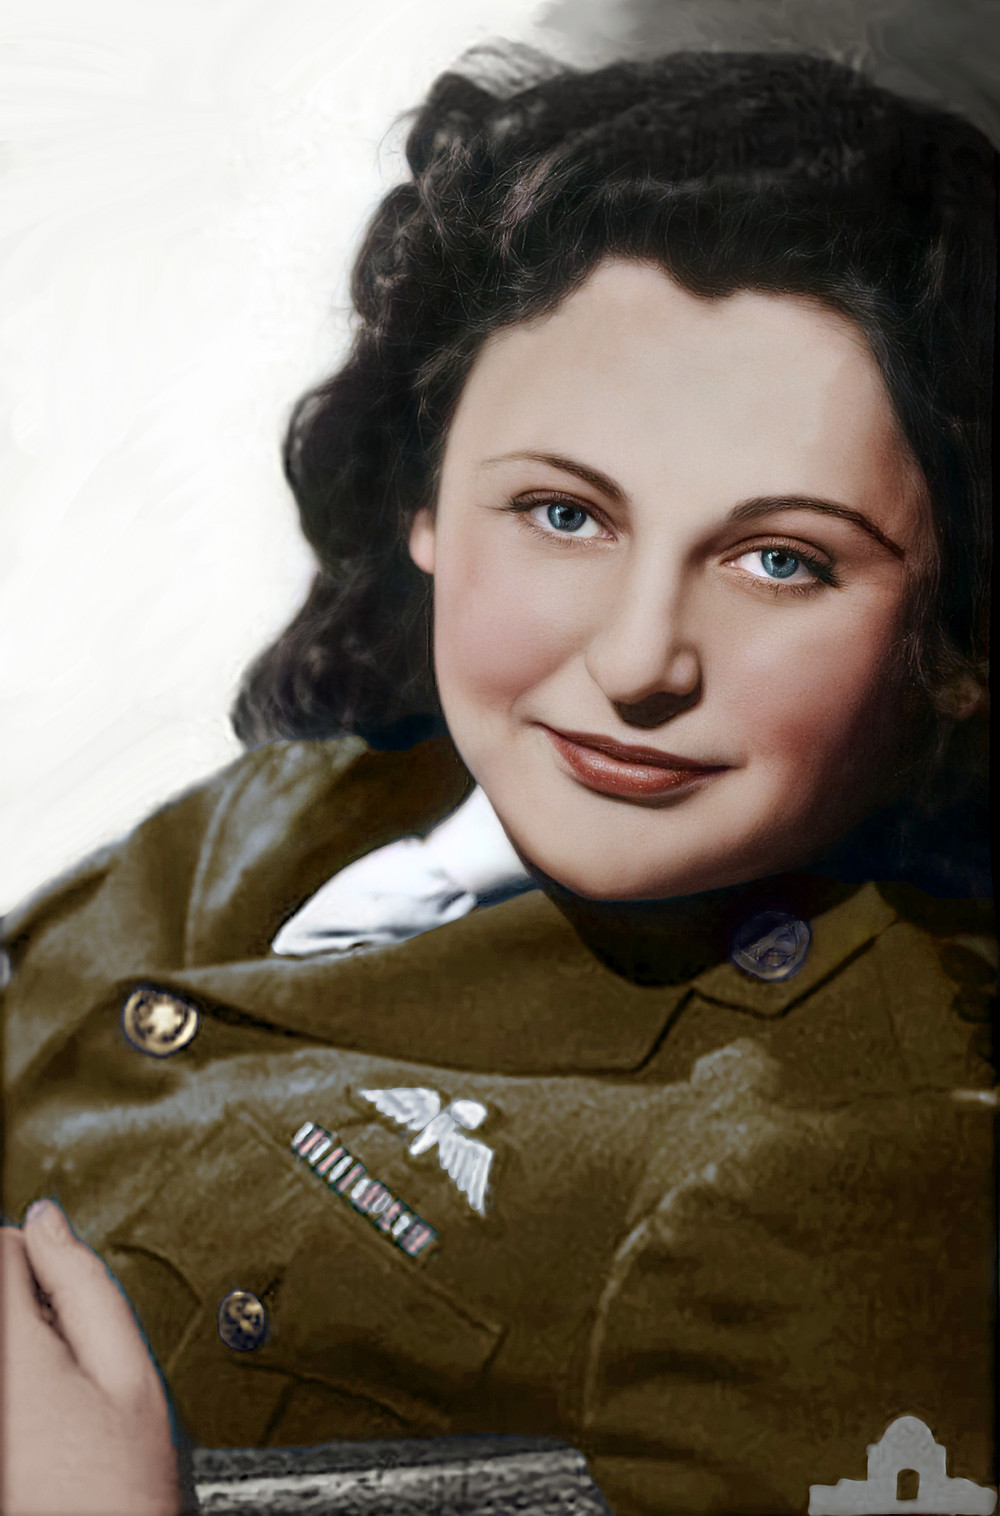 Nancy Wake - Colorization by Claudia D'Souza, the Photo Alchemist